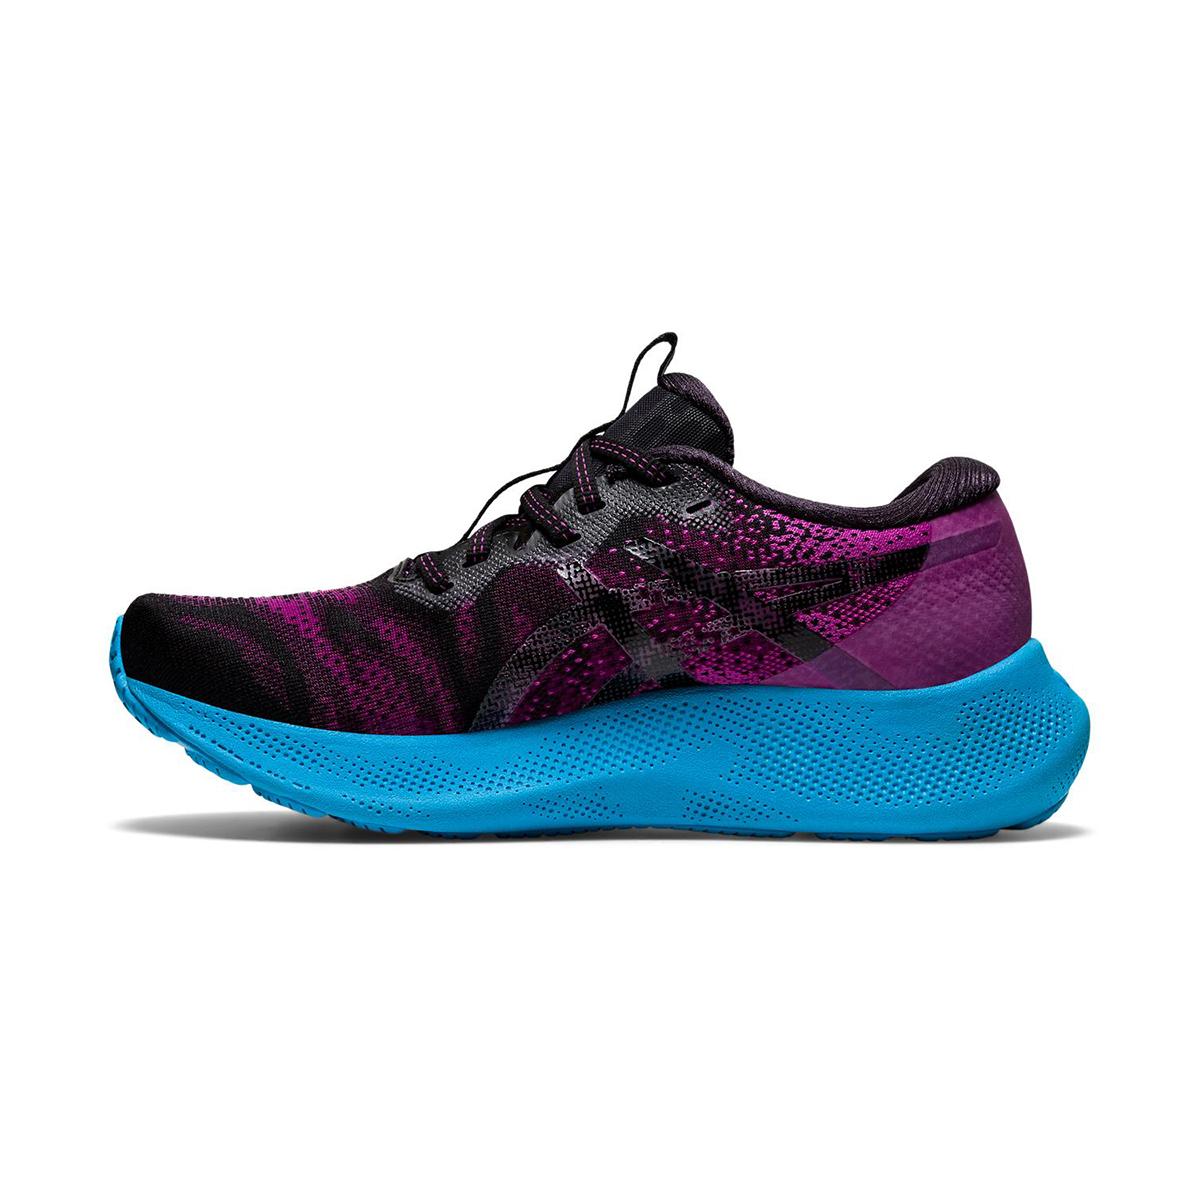 Women's Asics Gel-Nimbus Lite 2 Running Shoe - Color: Digital Grape/Black - Size: 5 - Width: Regular, Digital Grape/Black, large, image 2